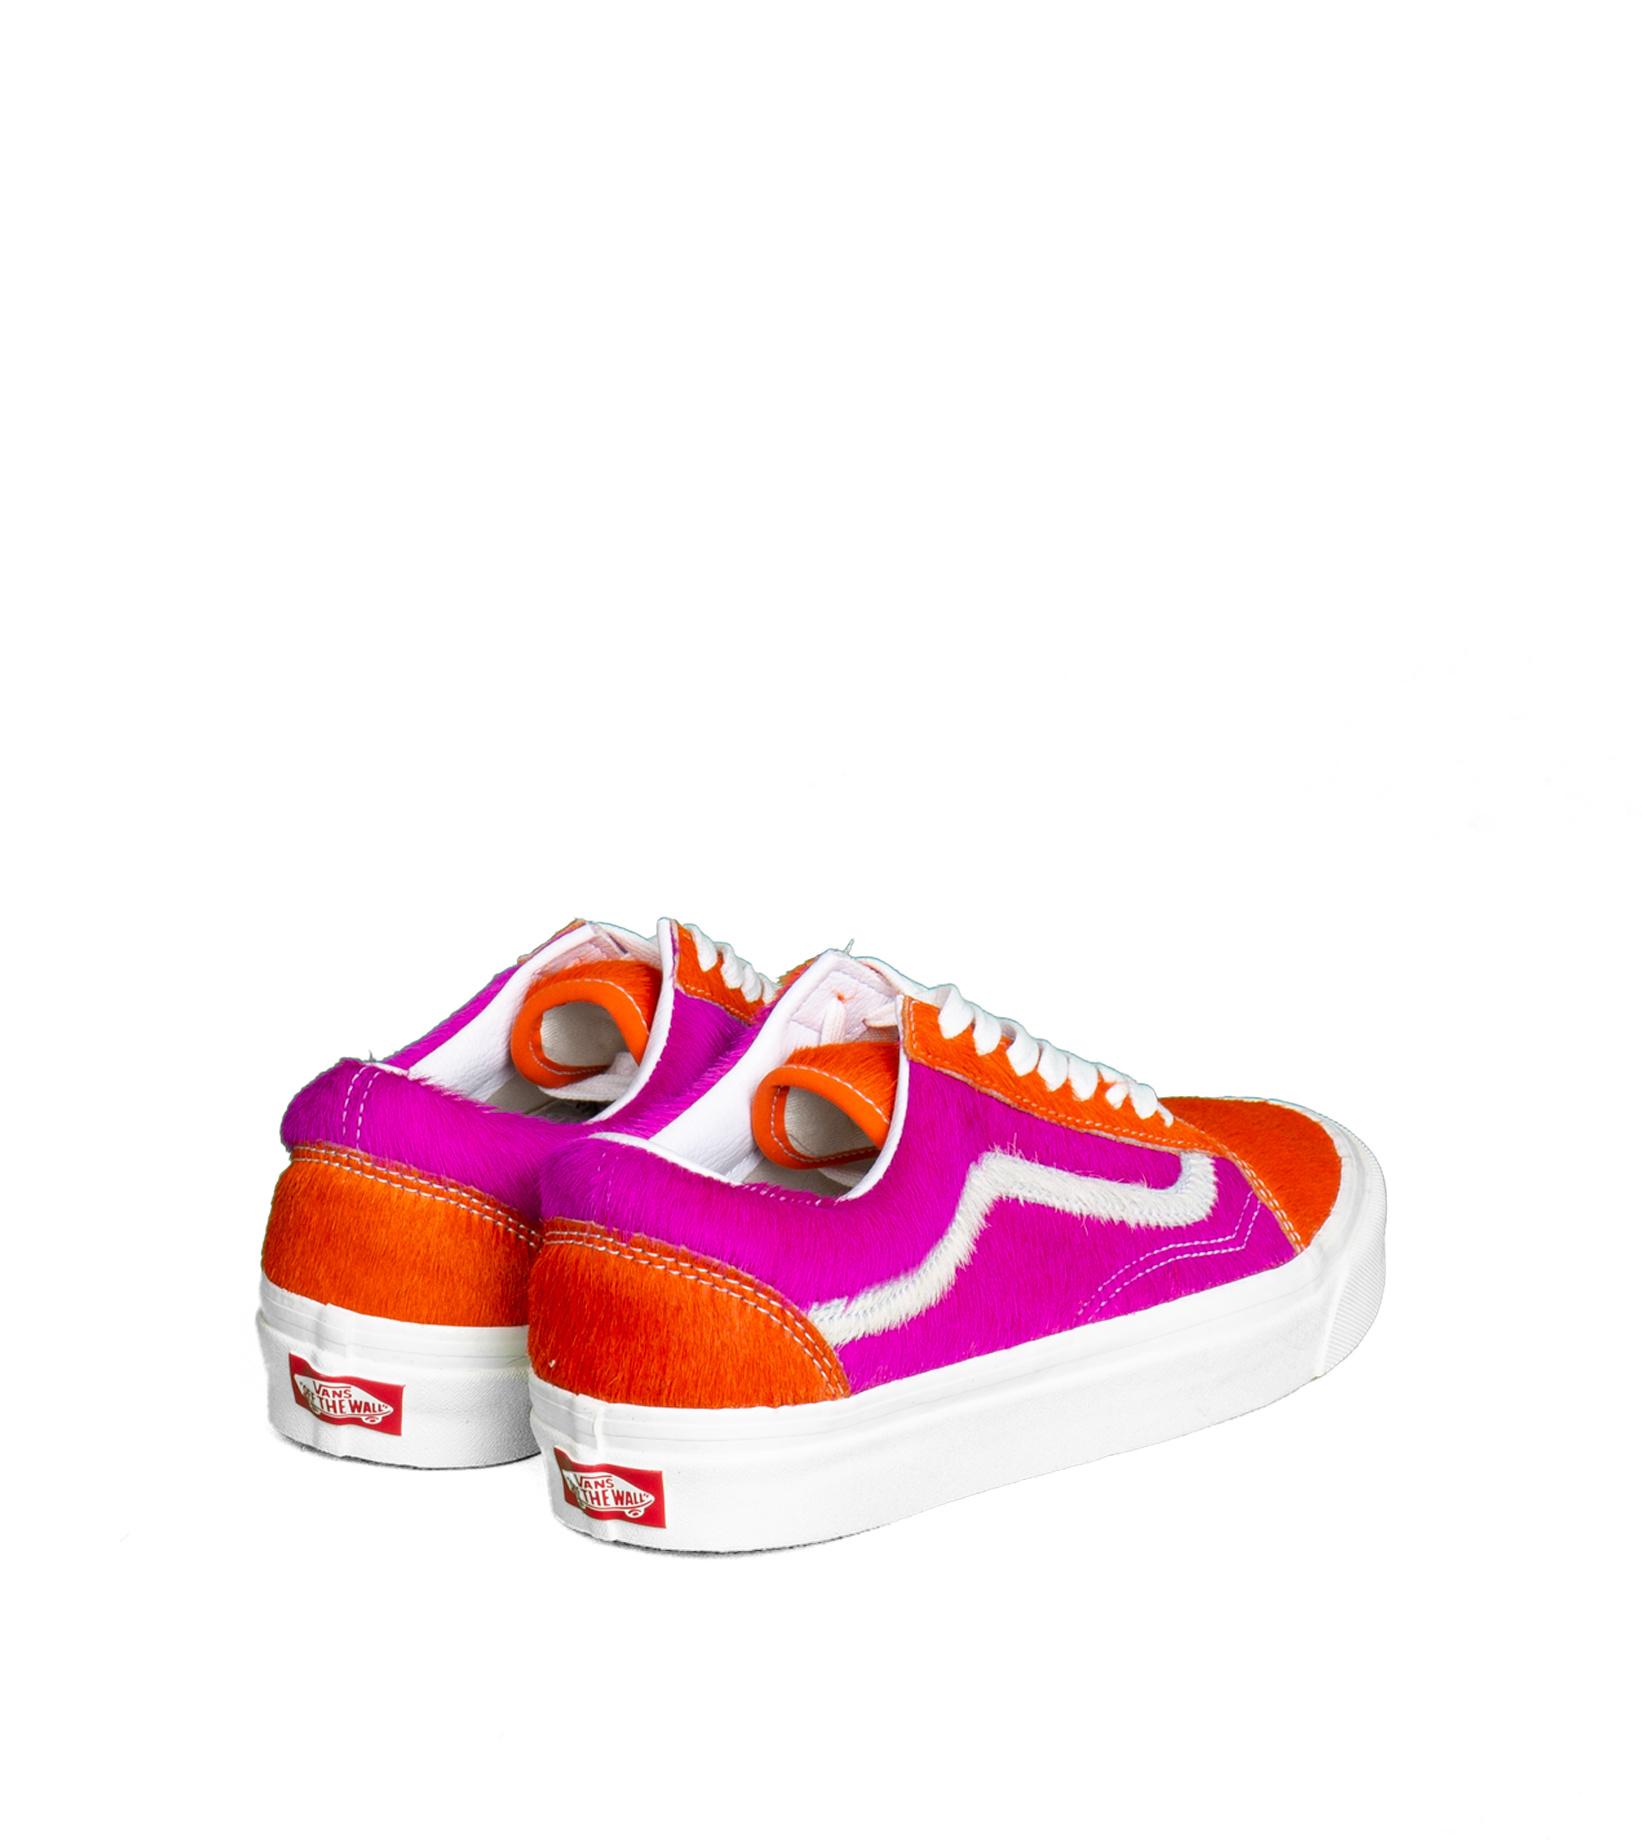 "Old Skool 36 DX (Anaheim Factory) ""Pink Pony/True White""-2"